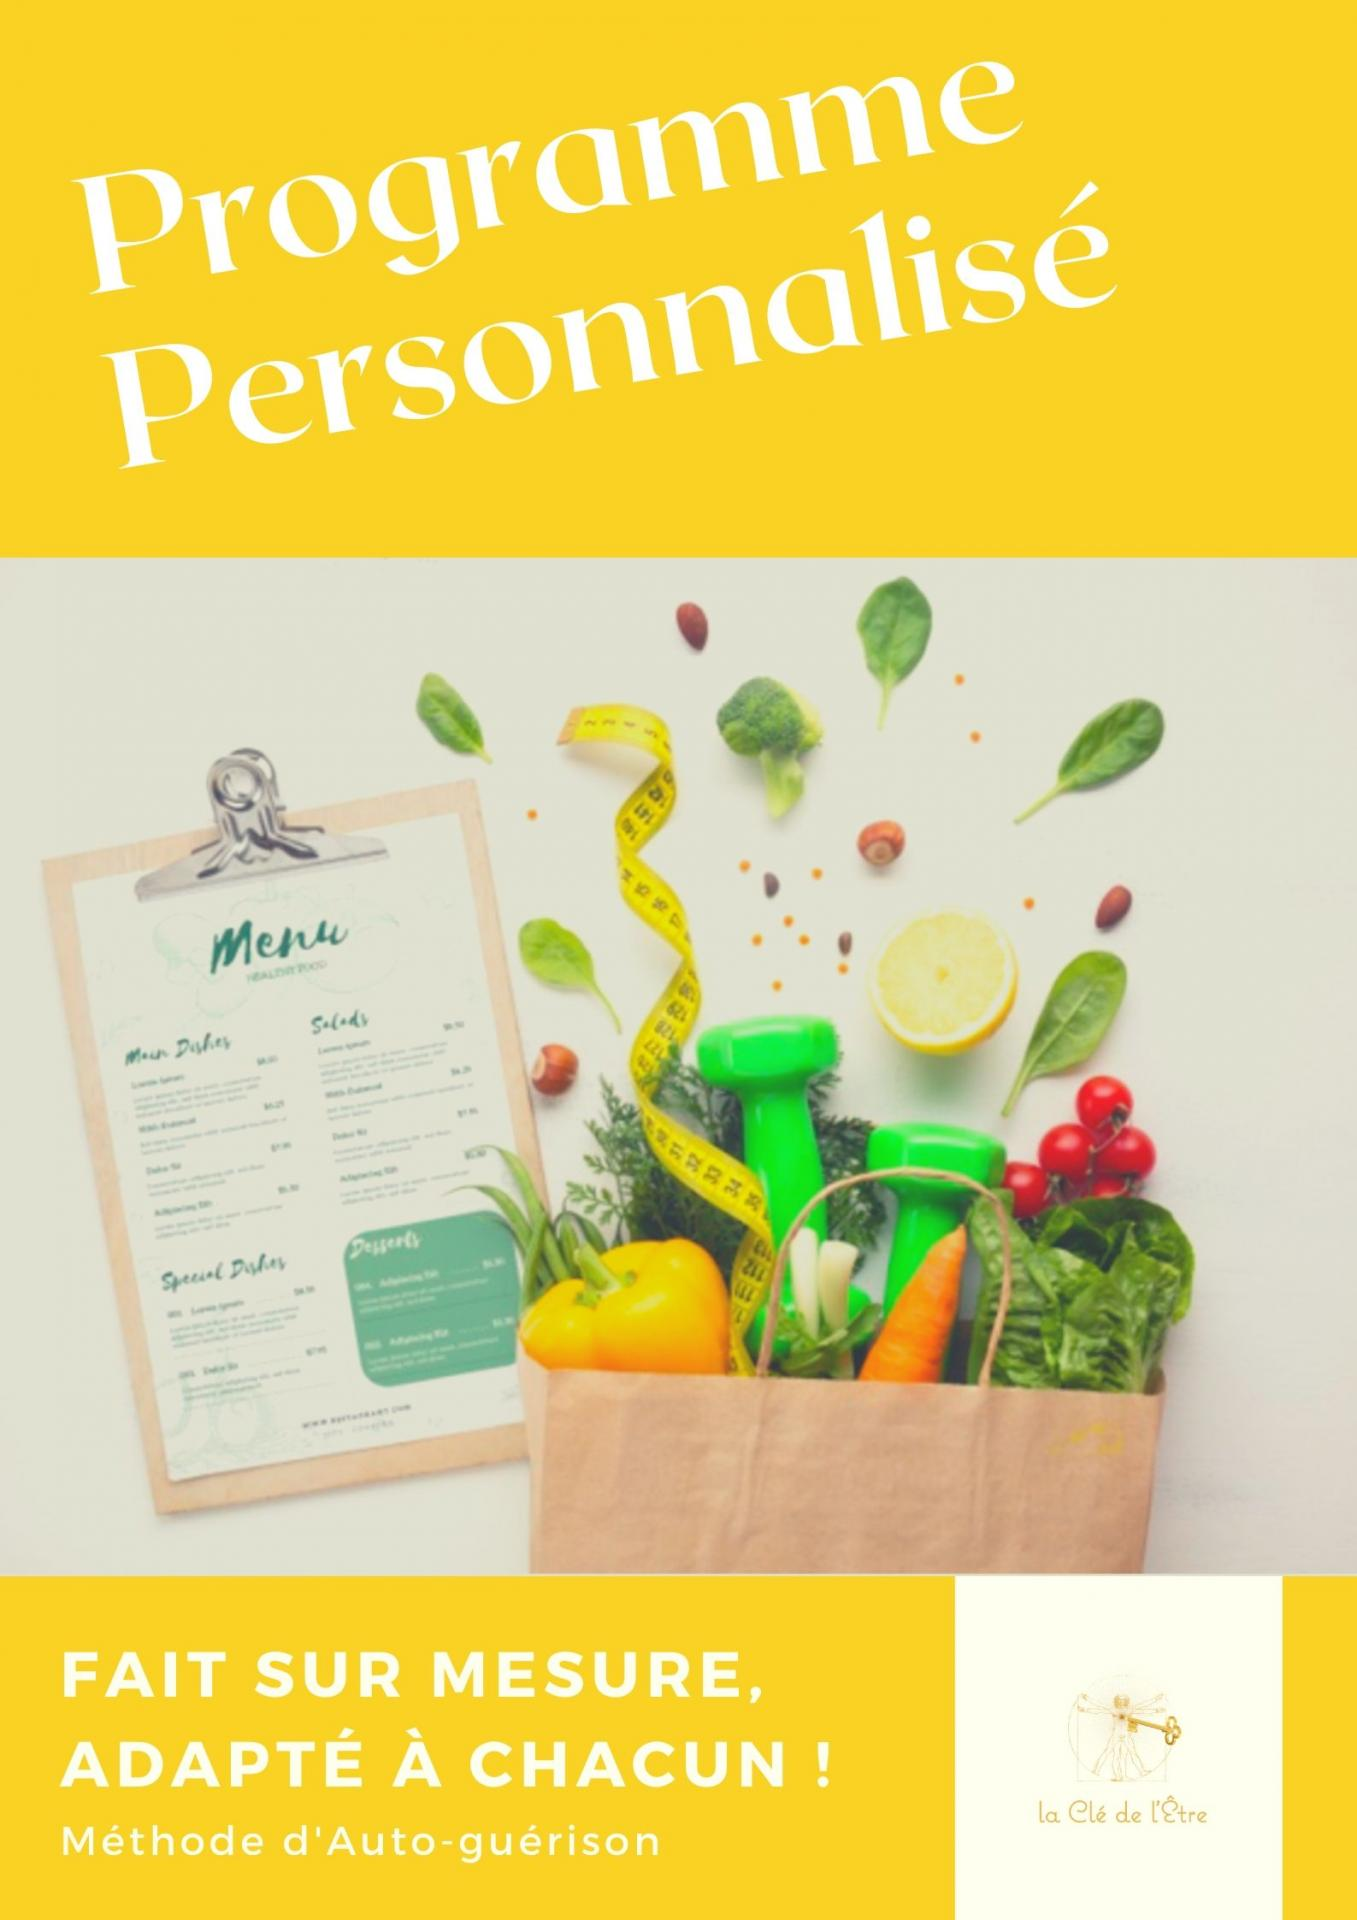 Programme personnalise